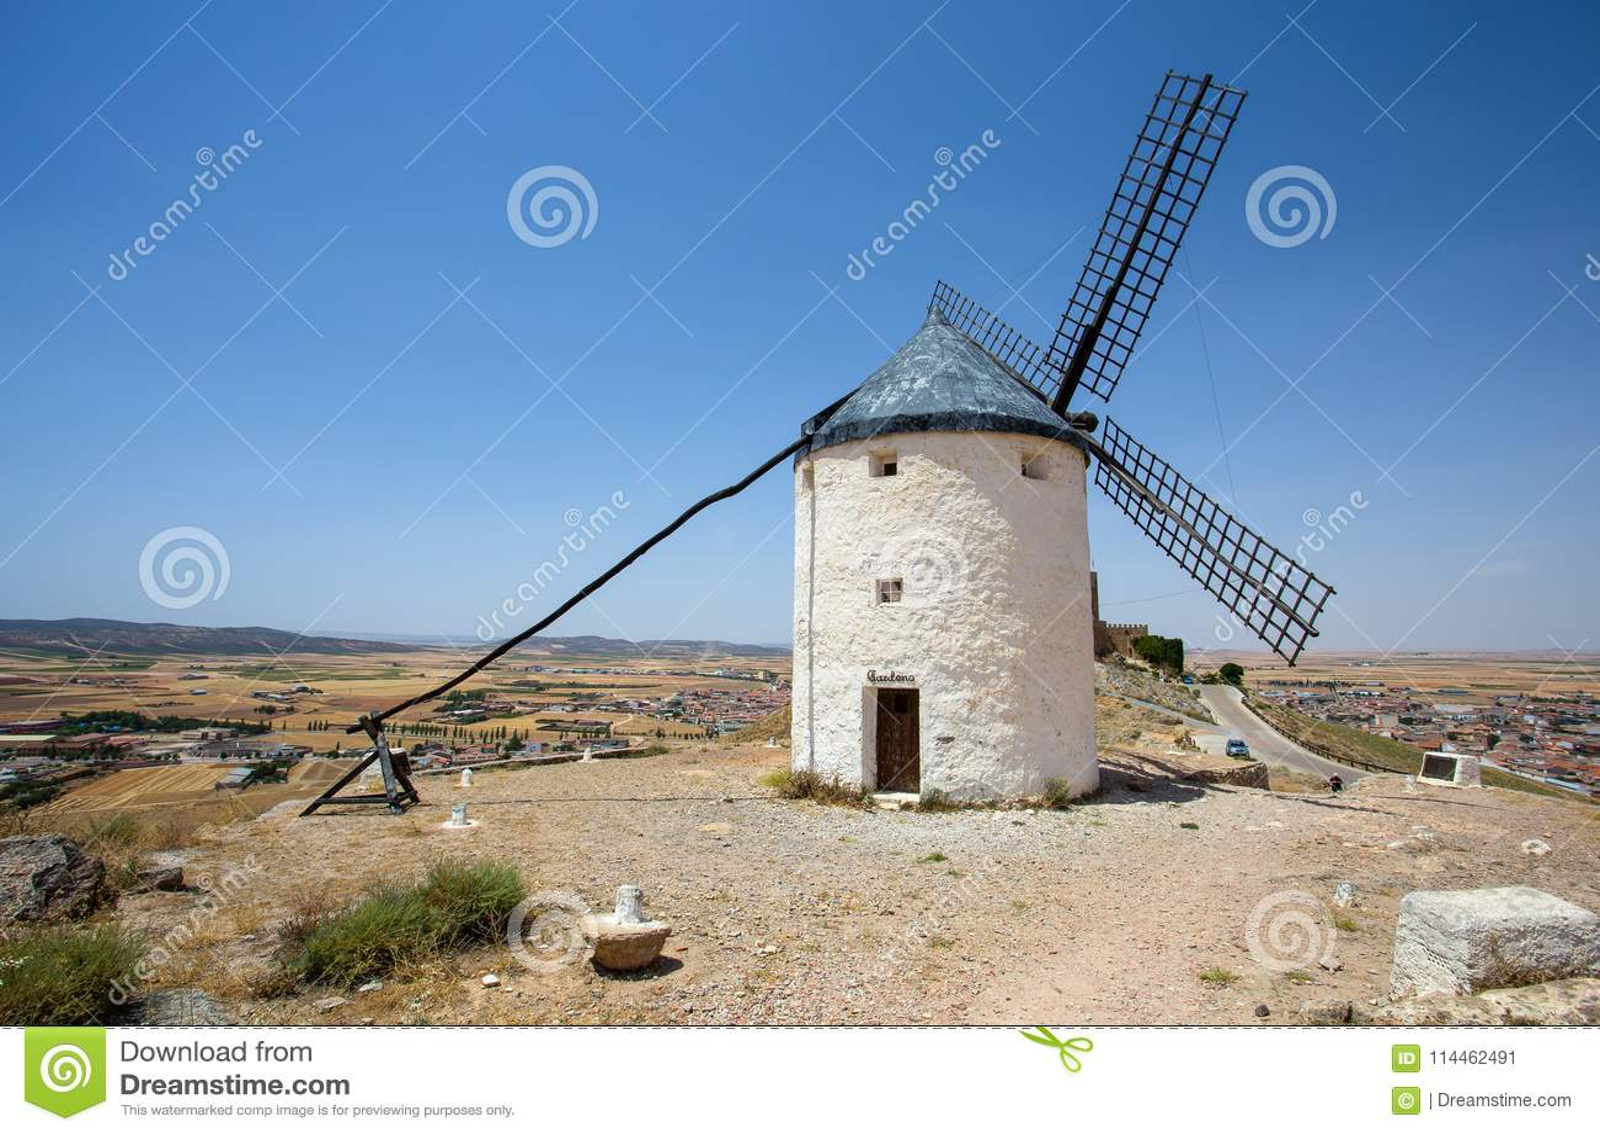 Väderkvarn i Campo de Criptana La Mancha, Consuegra, Don Quixote rutt, Spanien